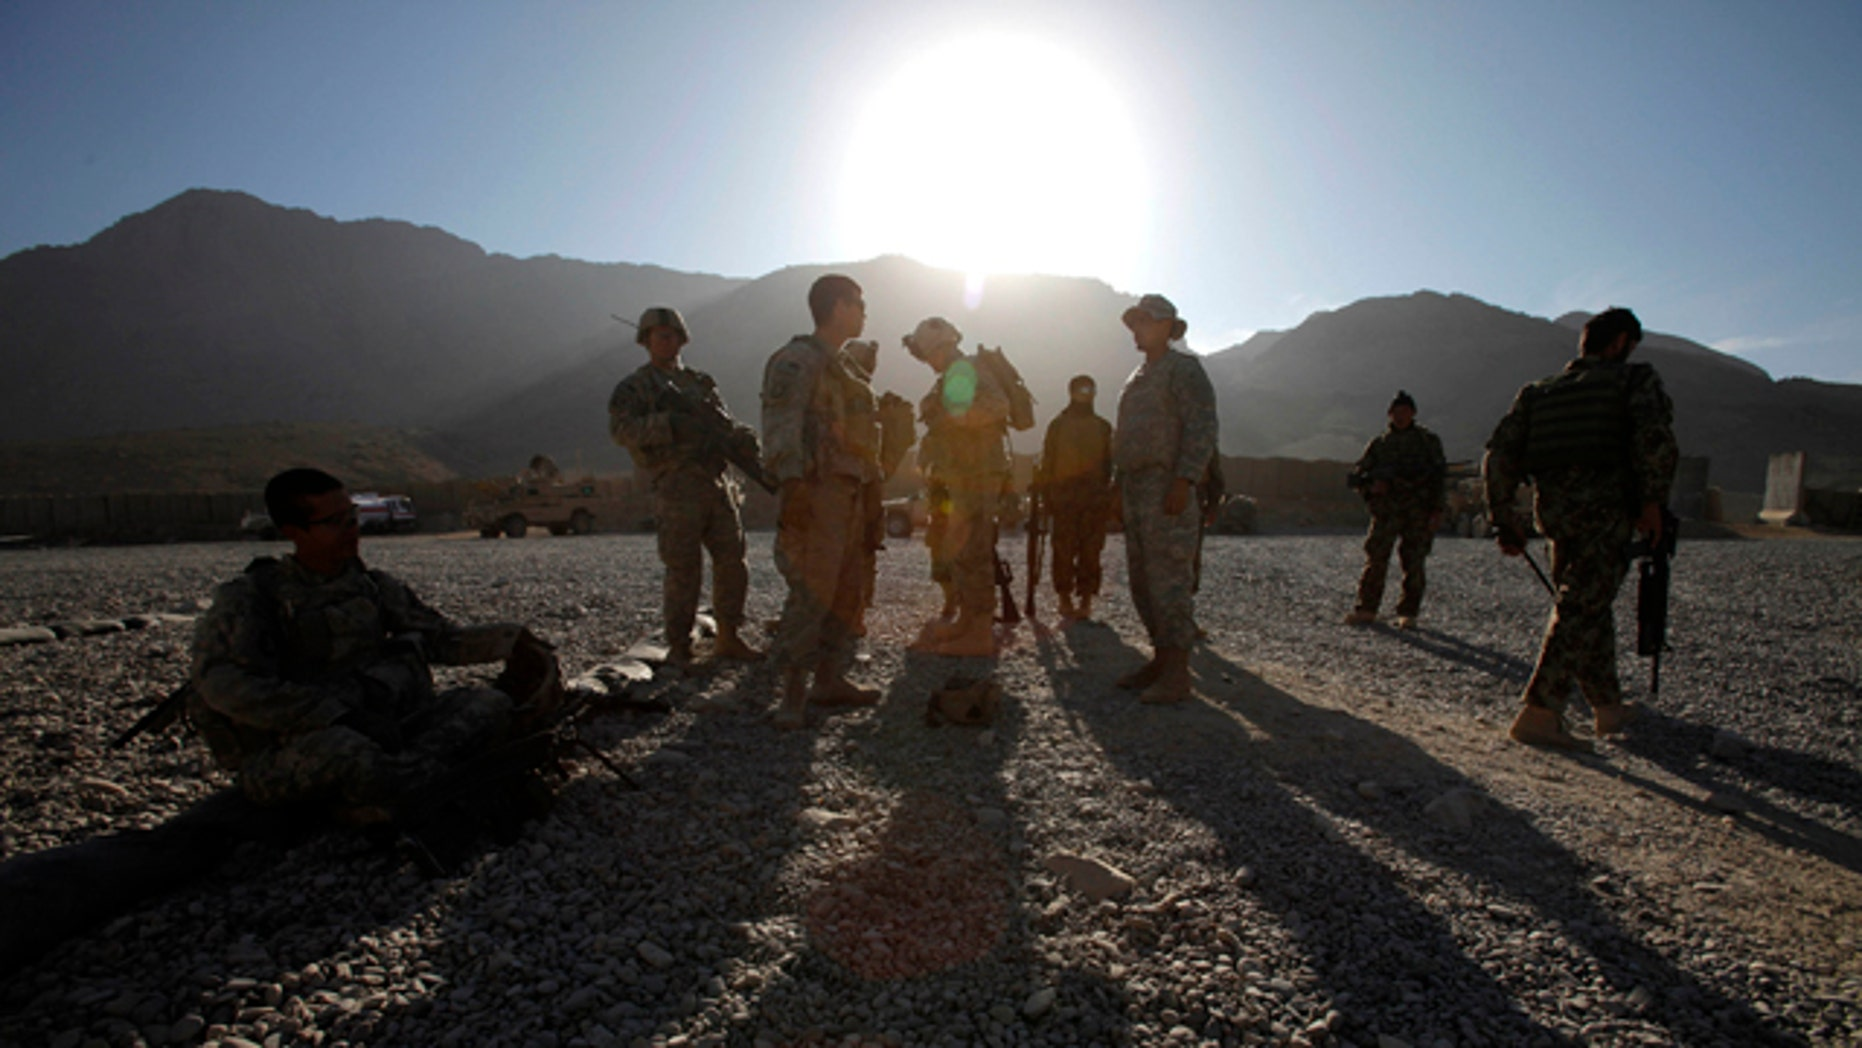 Nov. 22: U.S. Army soldiers and Afghan policemen prepare themselves for a foot patrol in West Now Ruzi village, district Panjwai, in Afghanistan.